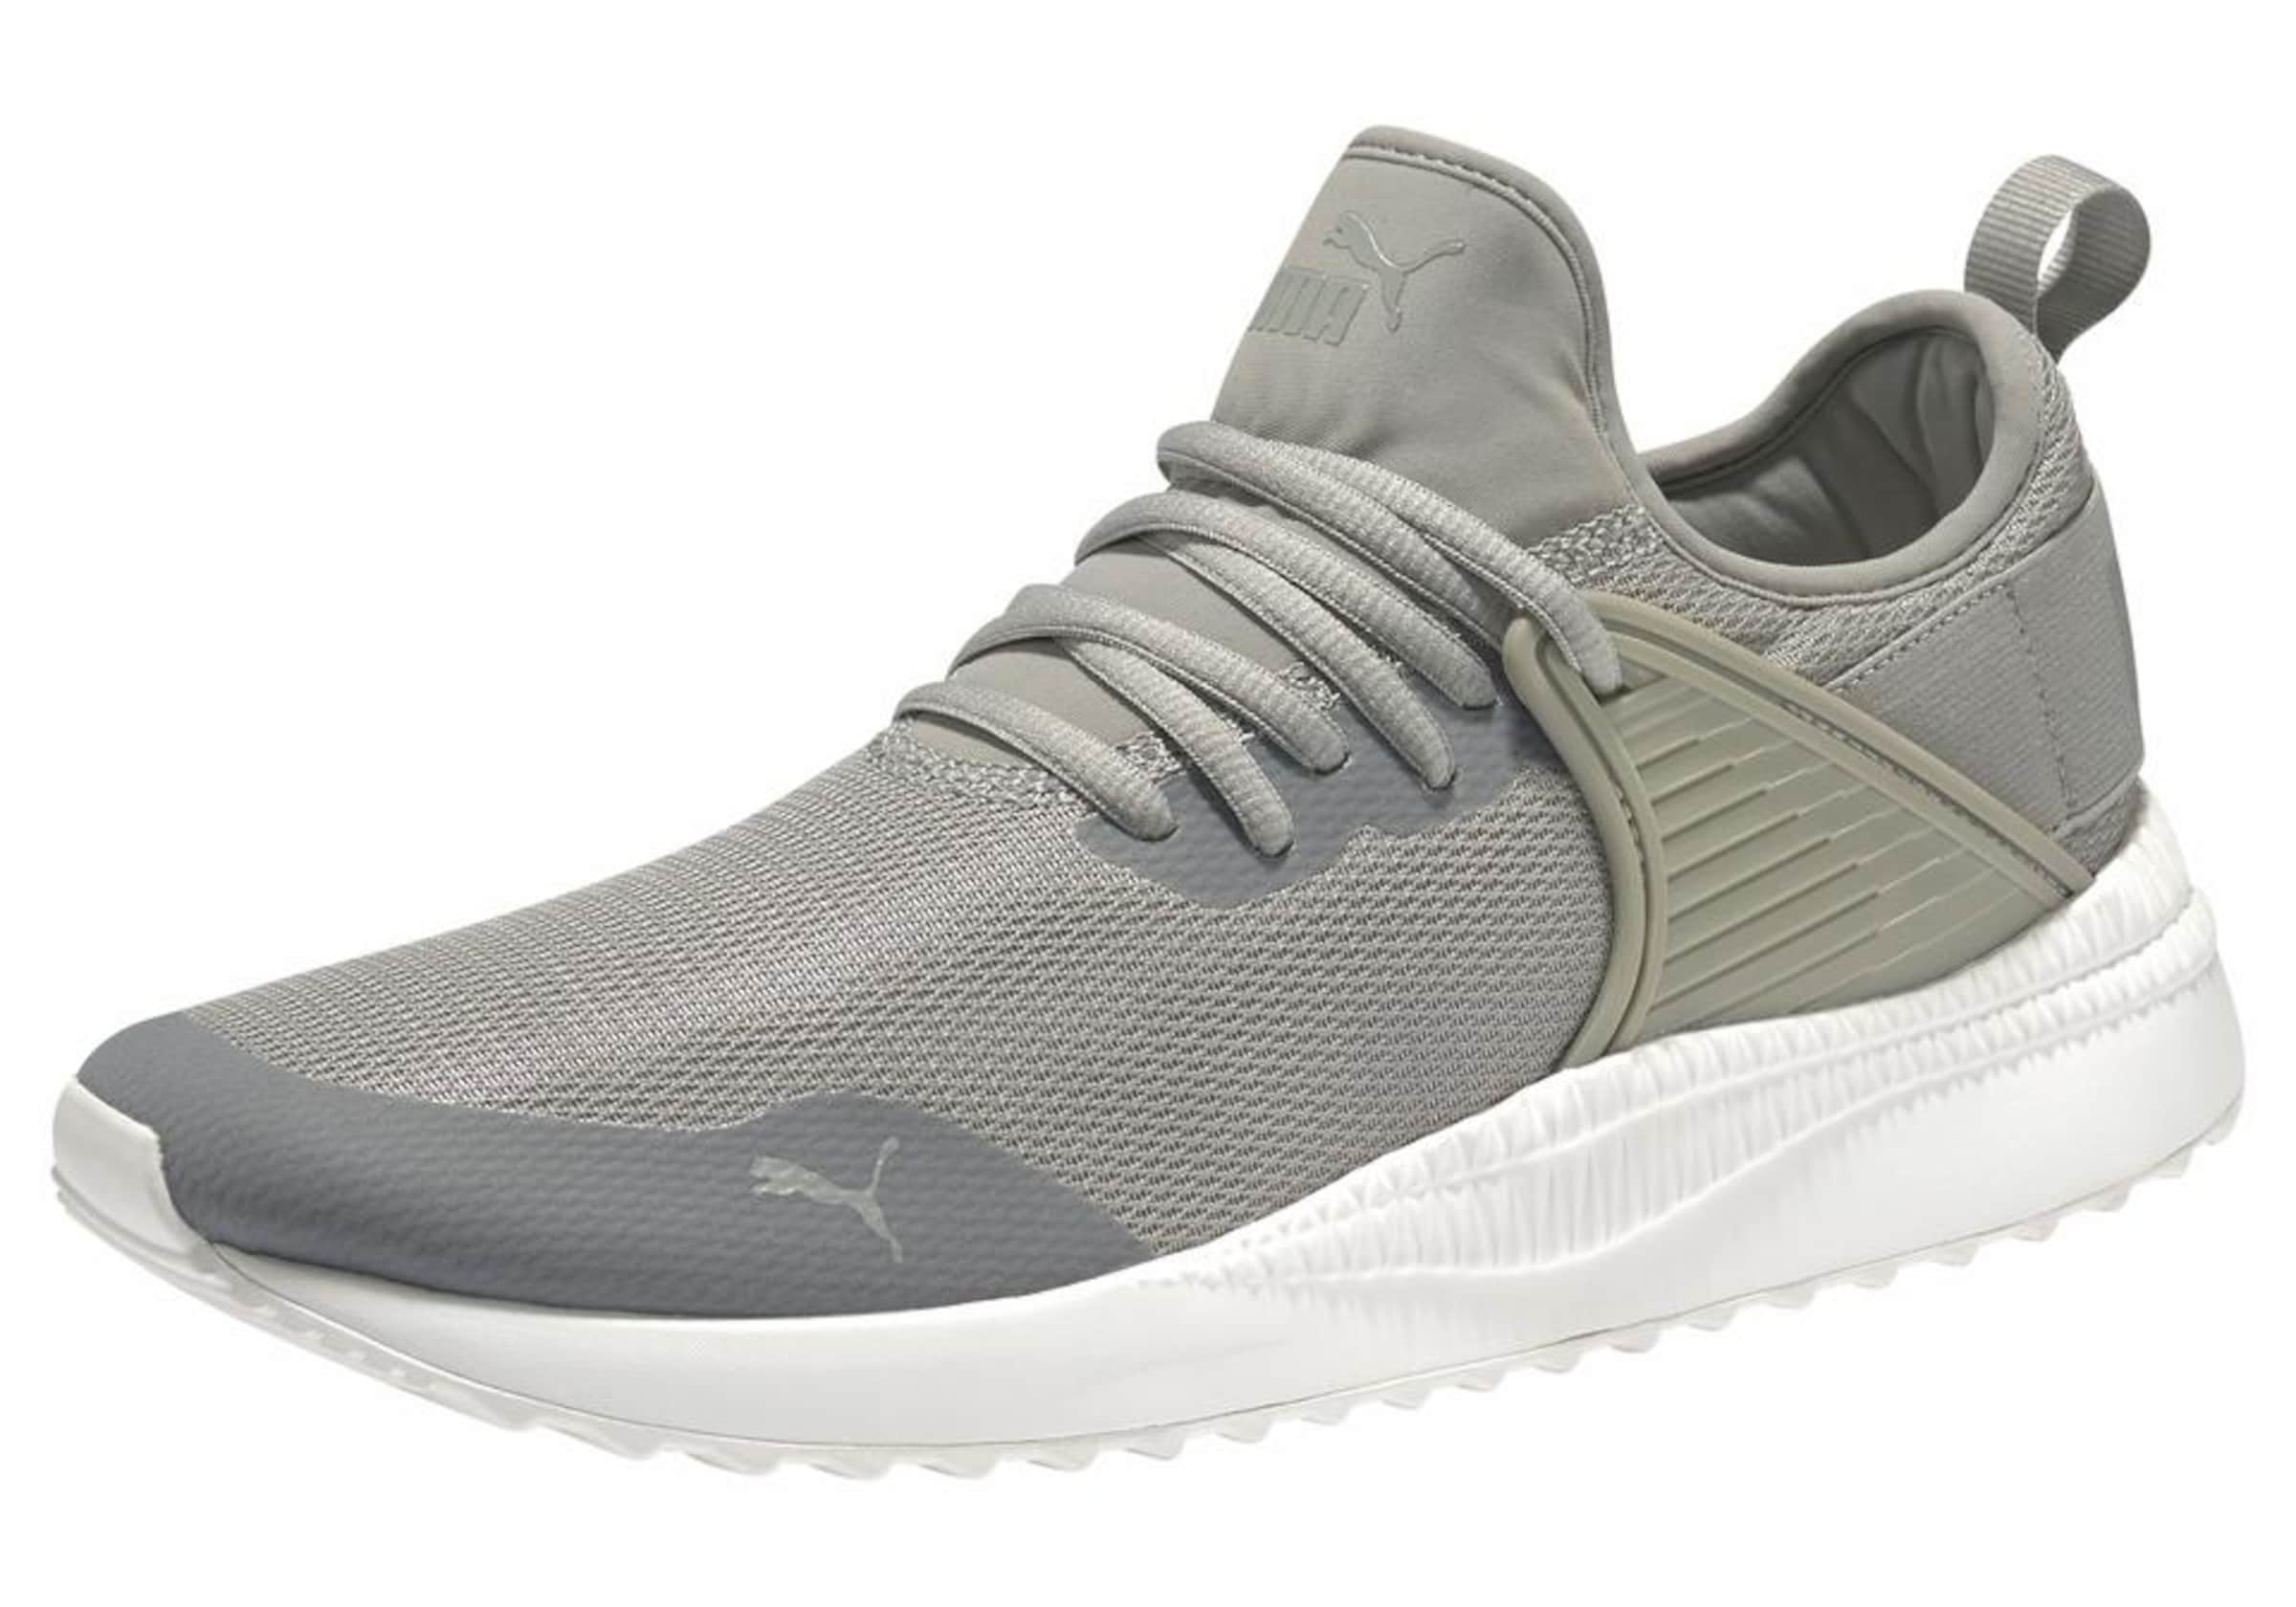 PUMA Sneaker Pacer Next Cage Hohe Qualität